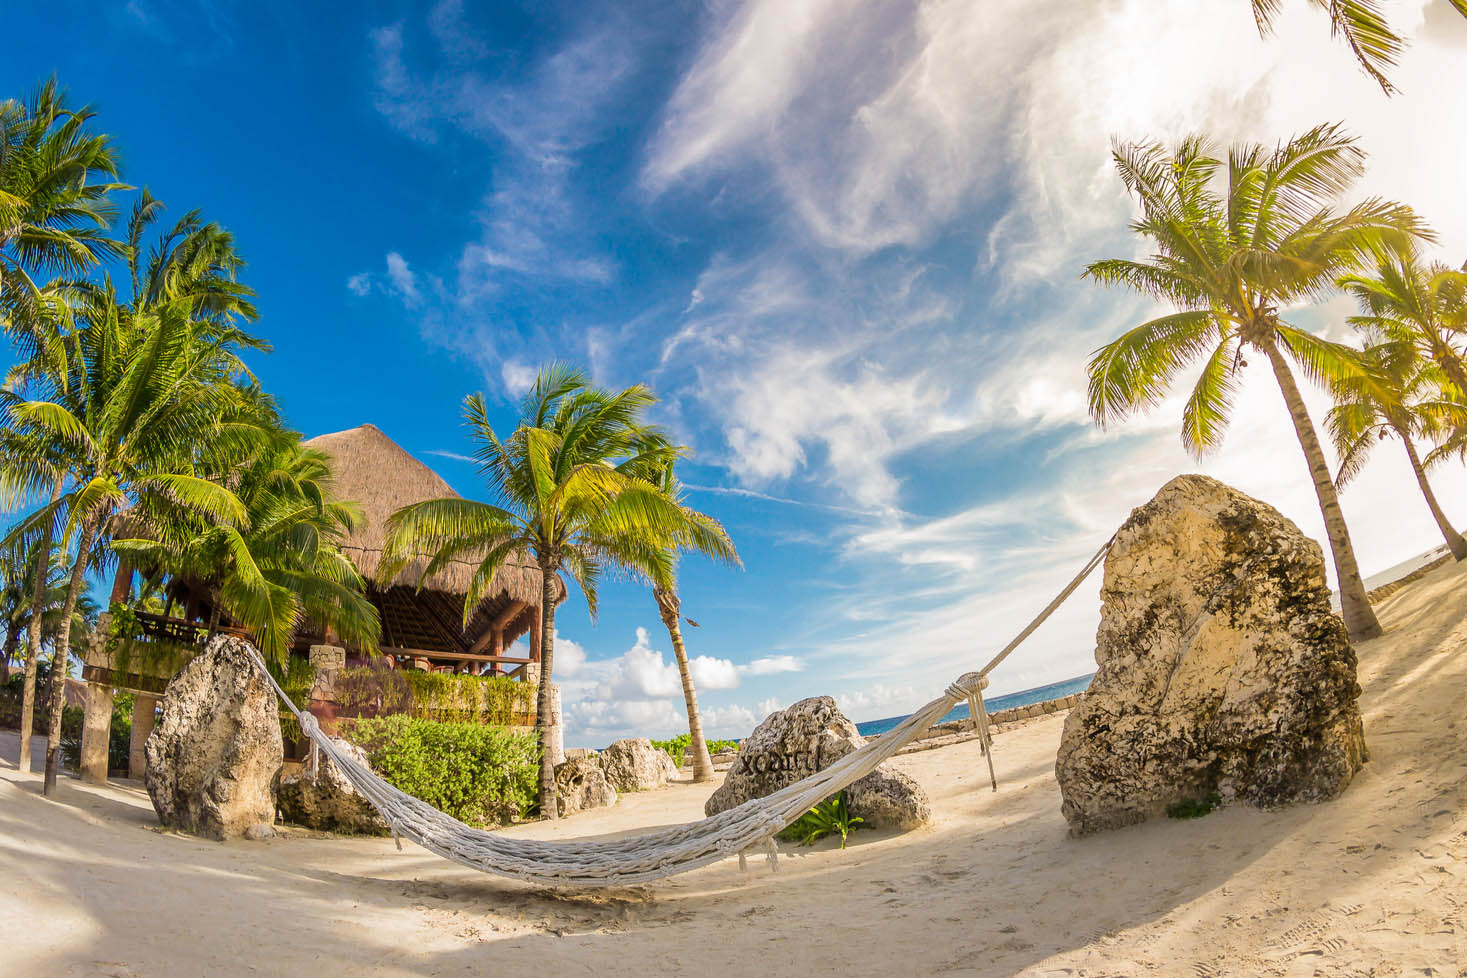 Que hacer en Cancun: parques temáticos - Avantrip Blog